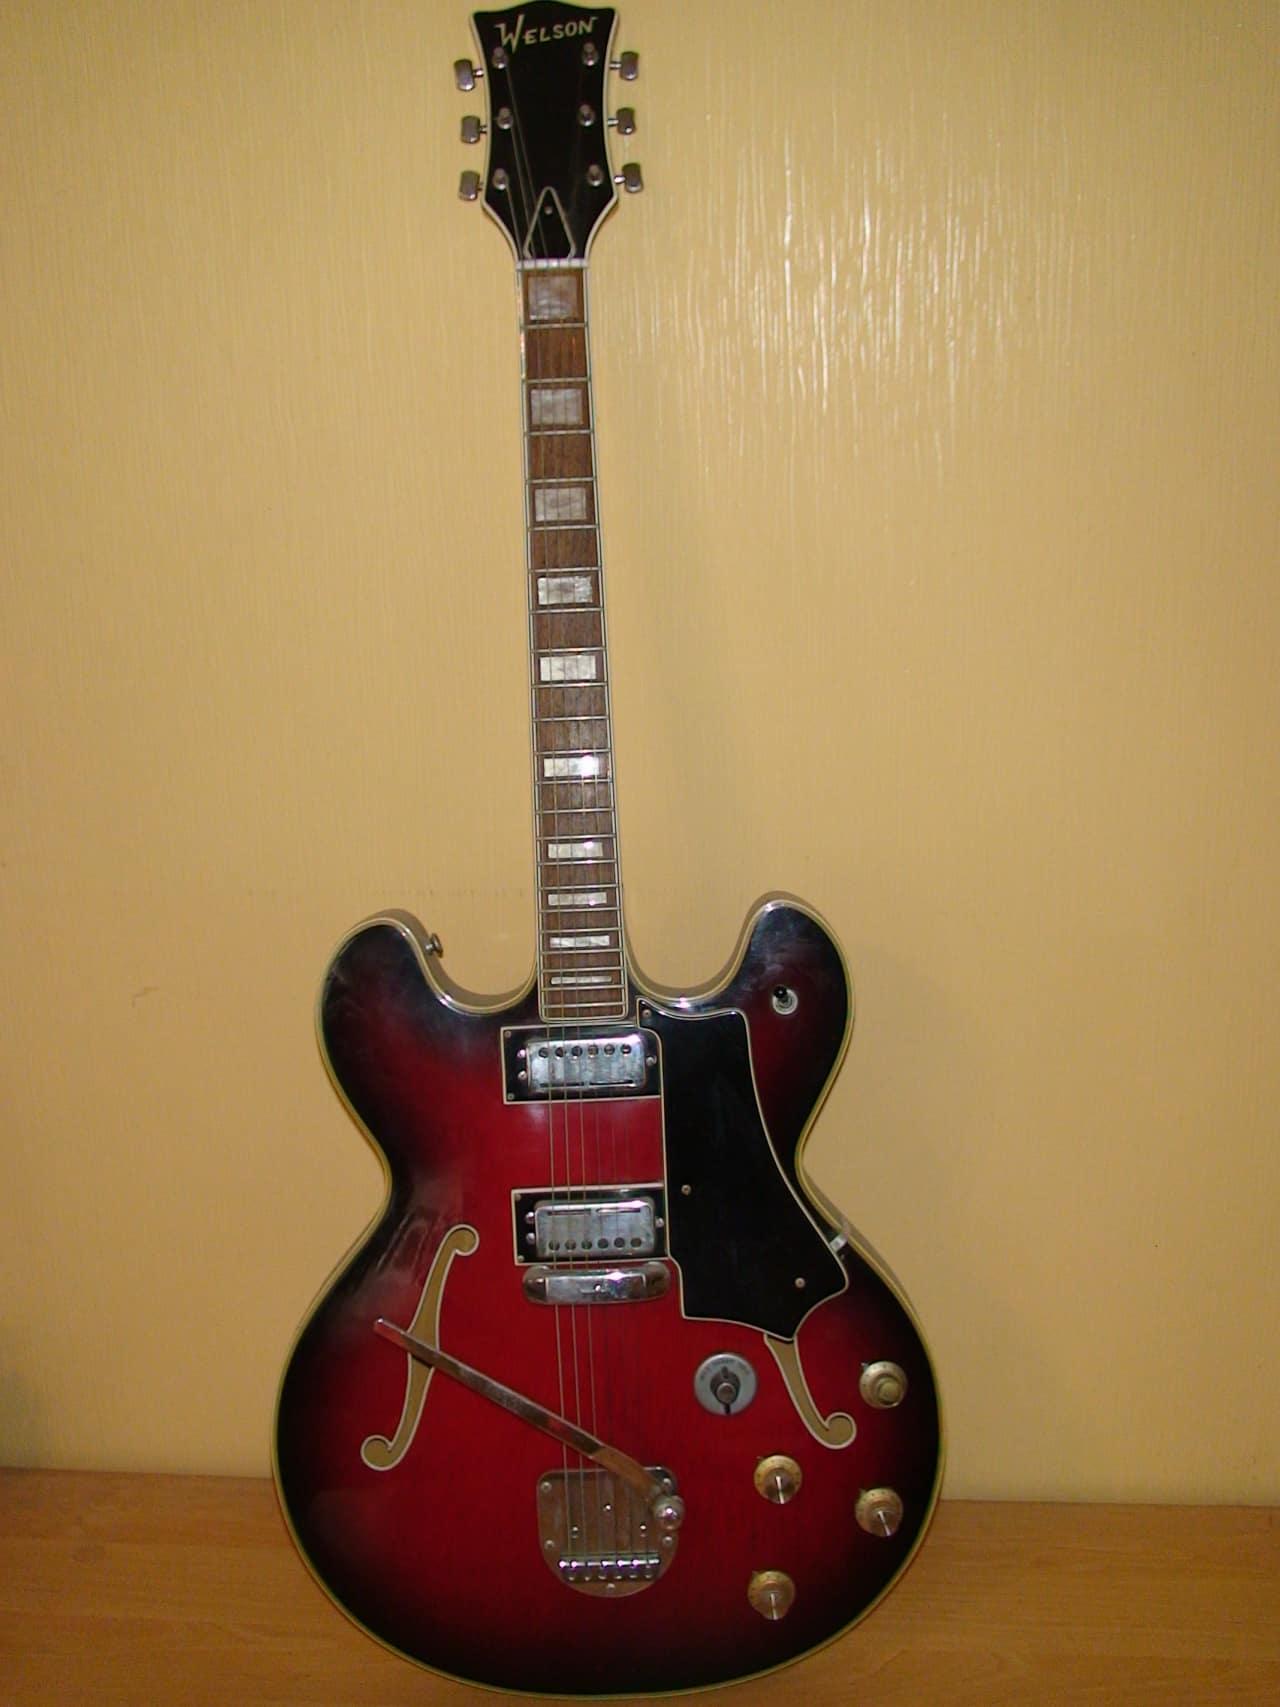 welson electric guitar 1960 very vintage reverb. Black Bedroom Furniture Sets. Home Design Ideas